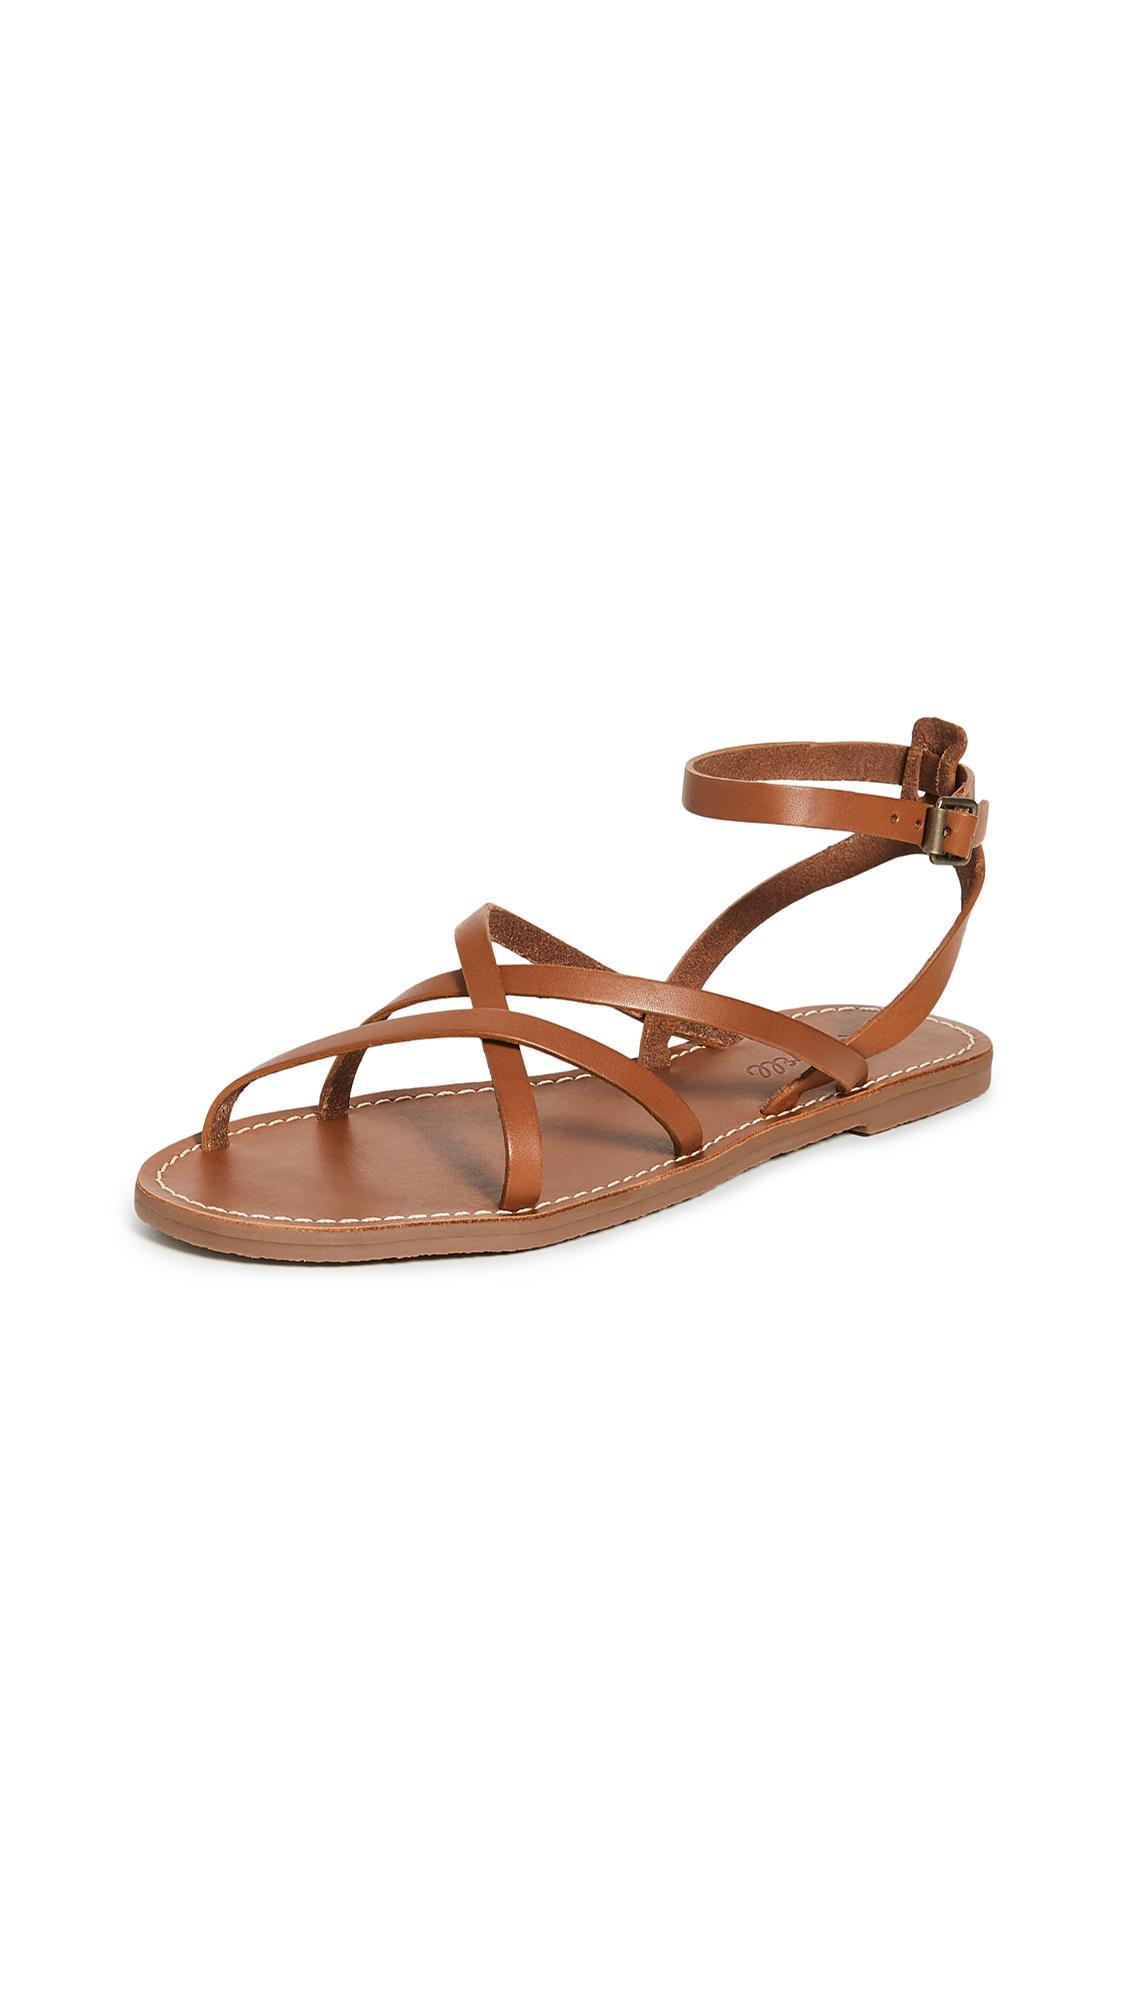 Buy Madewell Boardwalk Skinny Strap Sandals online, shop Madewell